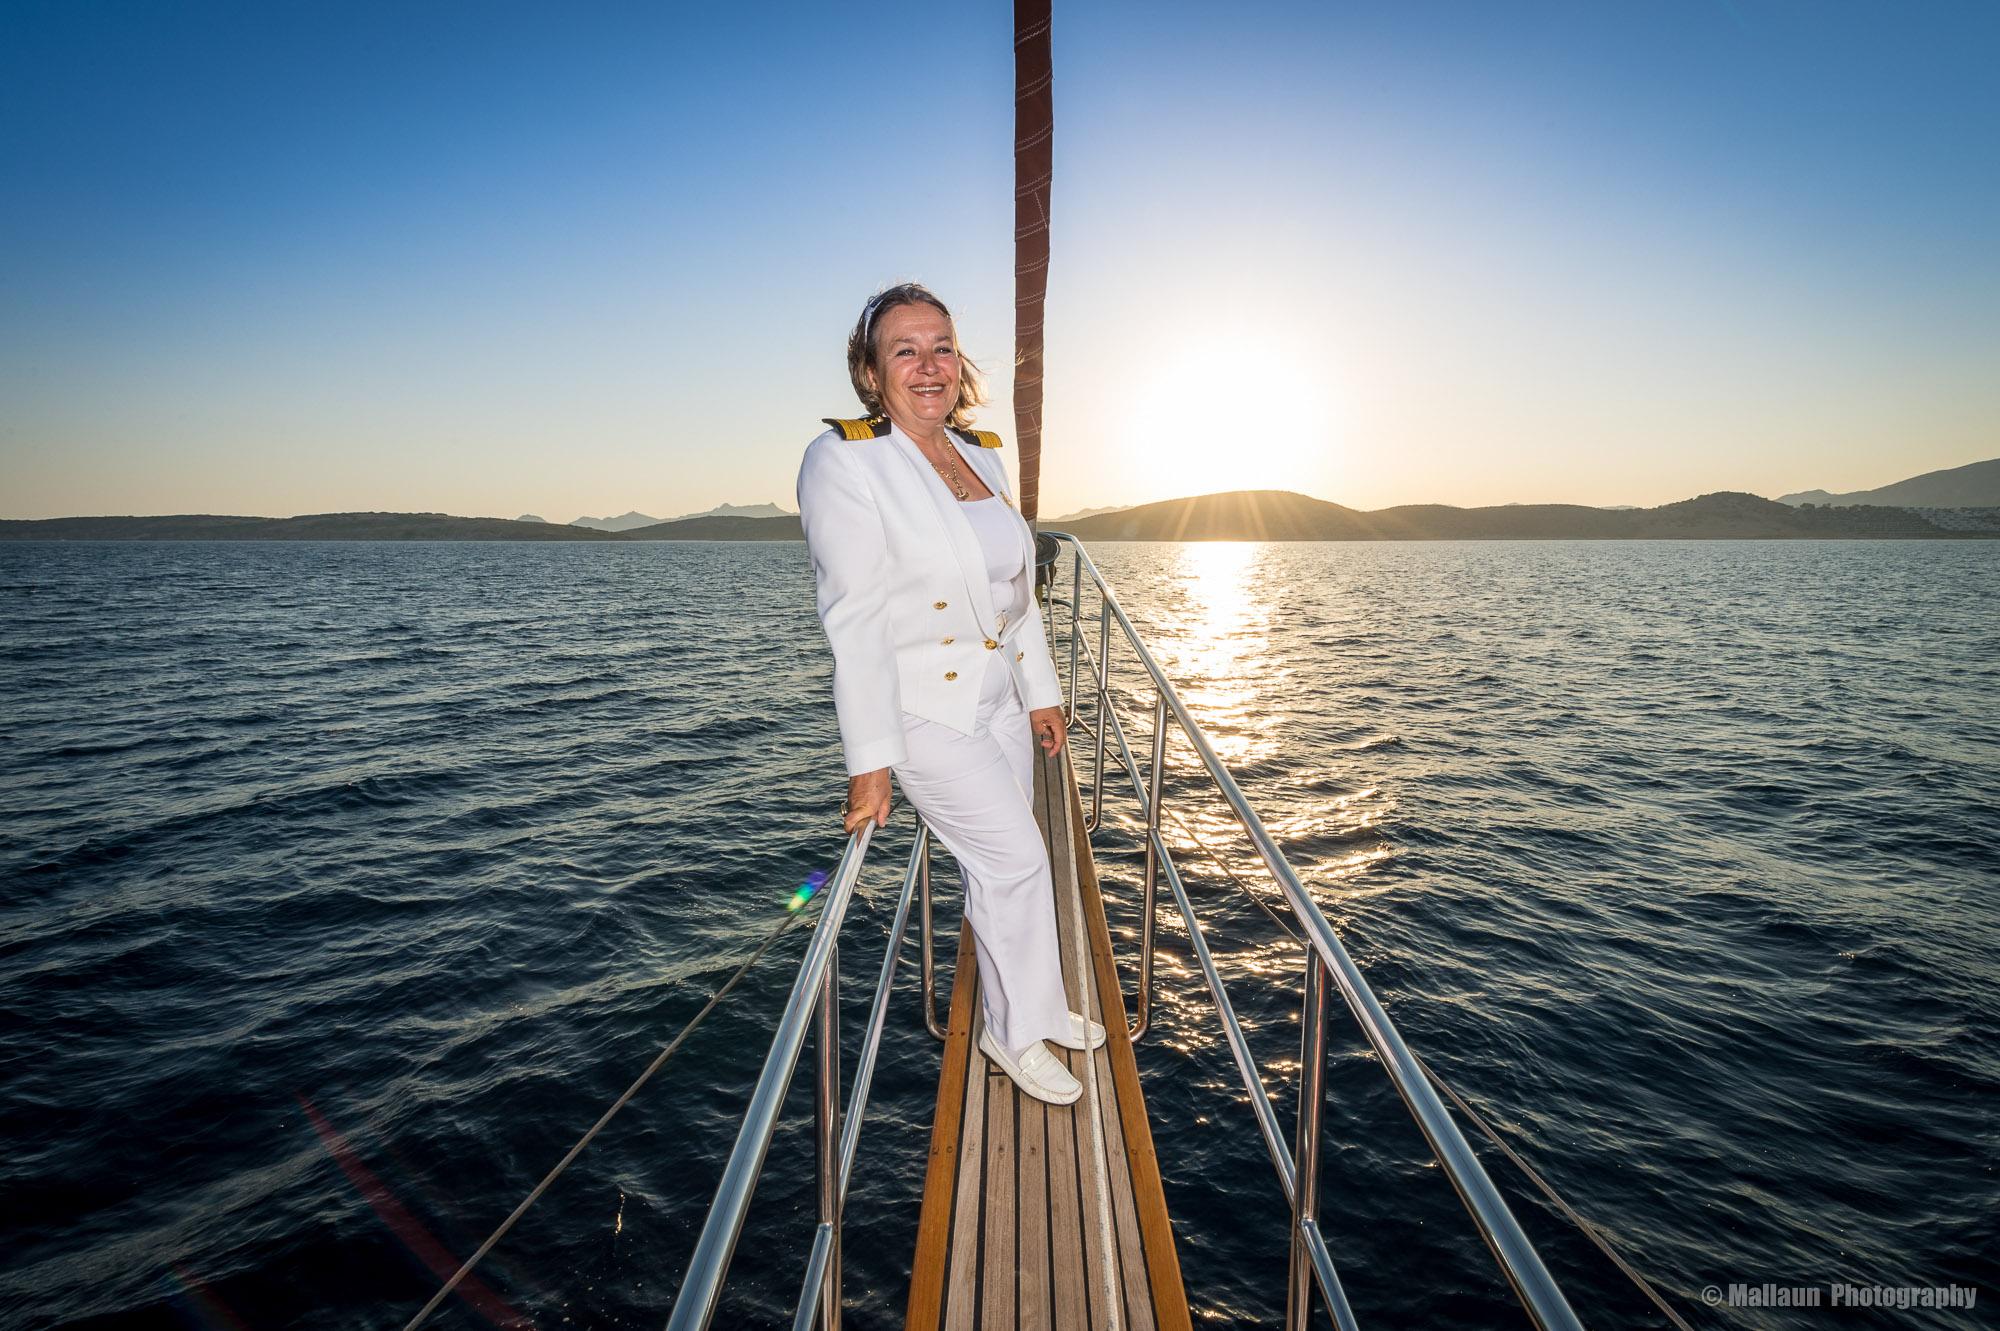 Nazan Corta ist die einzige Kapitänin der Türkei © Mallaun Photography